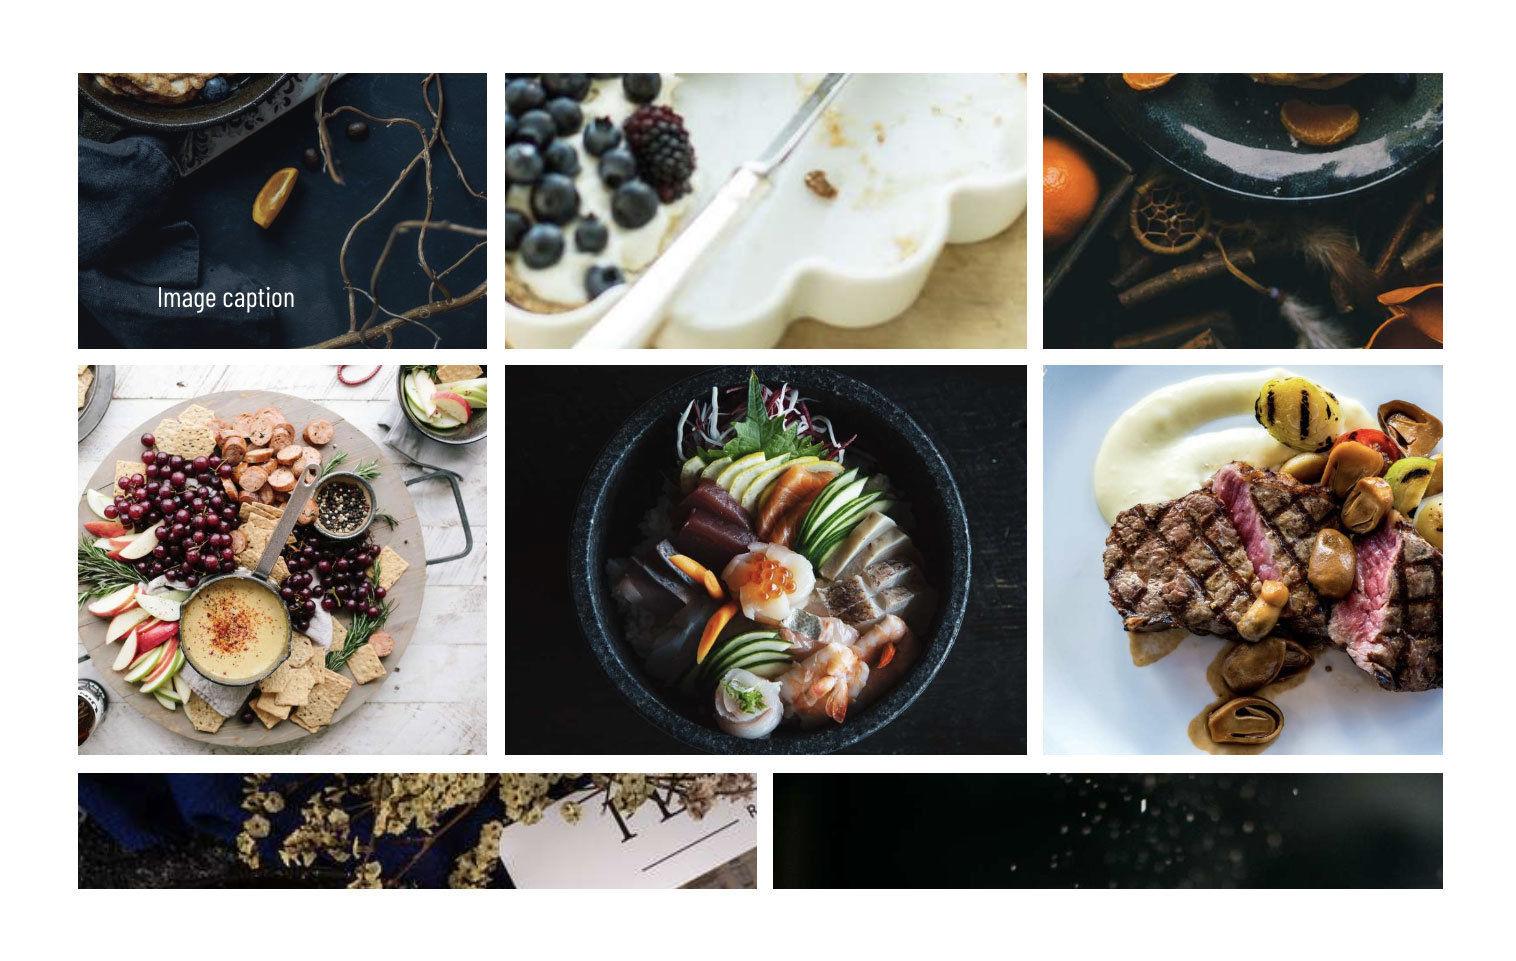 Cortado Restaurant HTML Theme Image Gallery